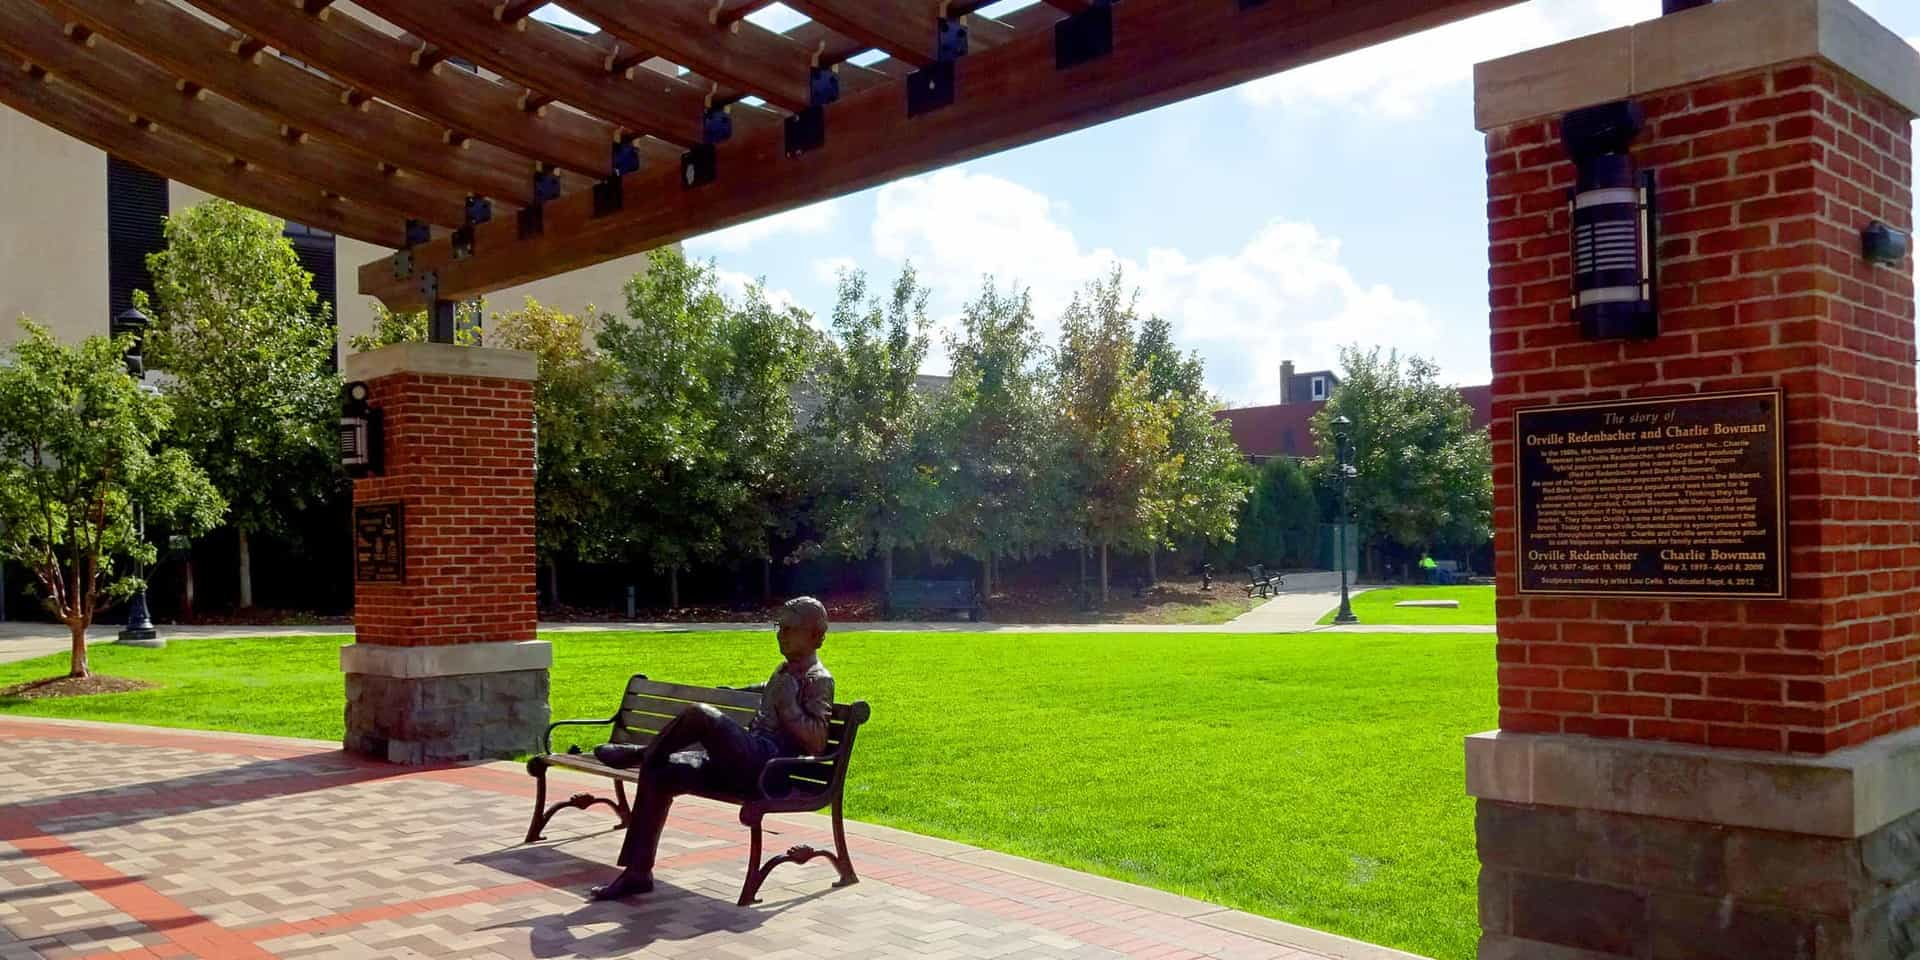 Bronze statue of man sitting on park bench under pergola